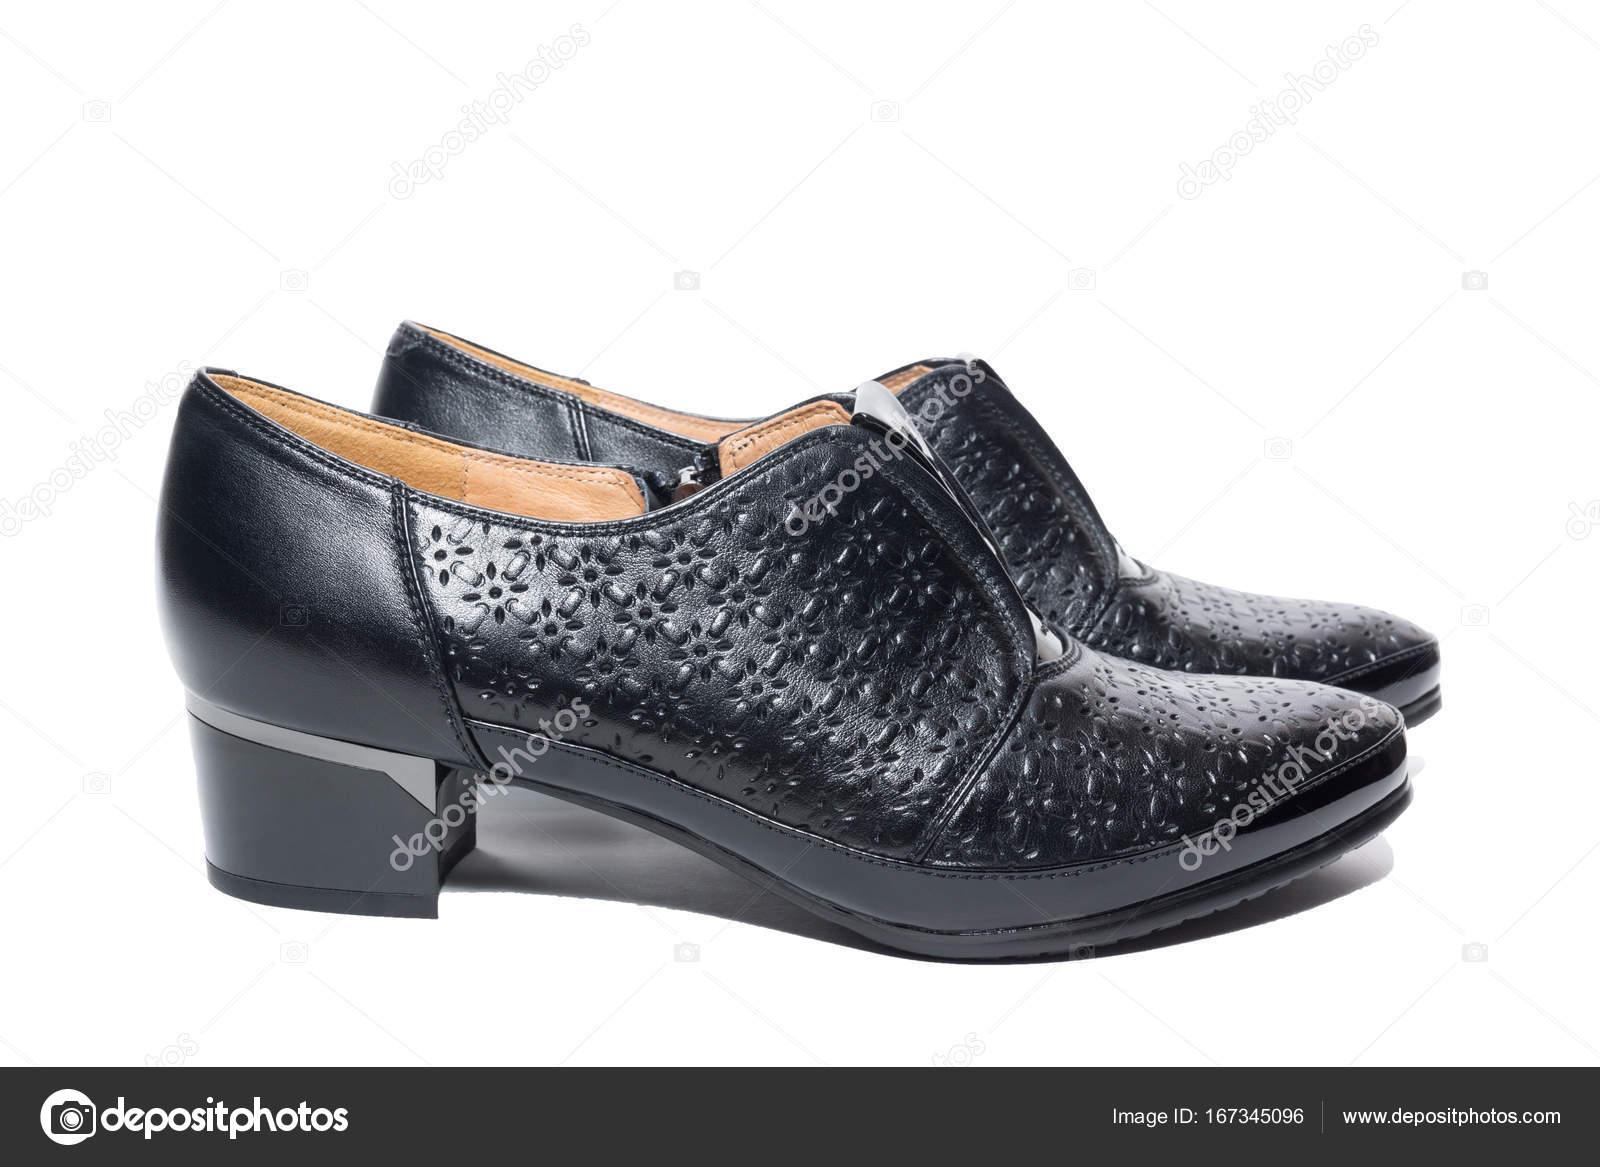 Schwarze Damensportschuhe